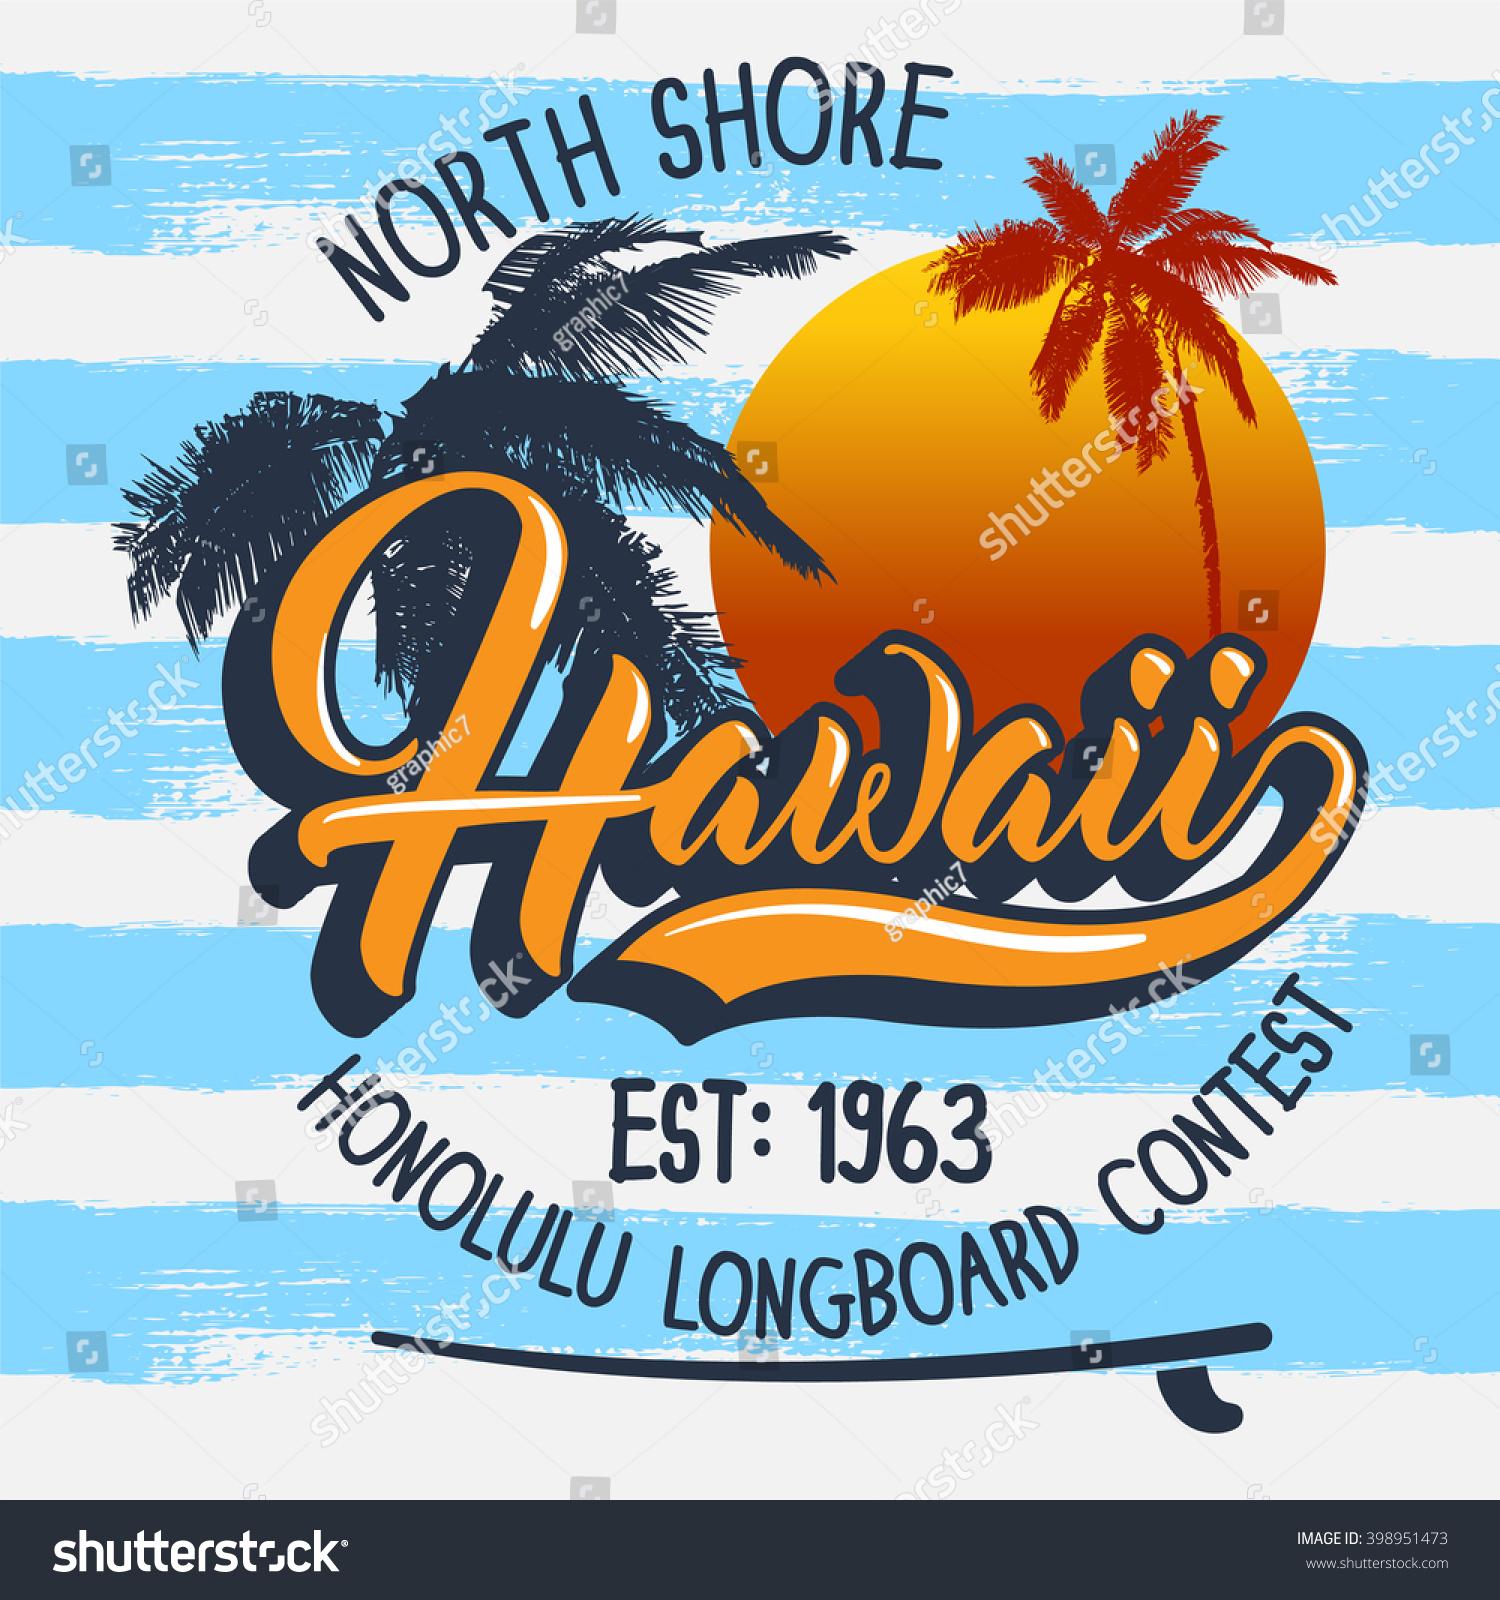 T shirt design hawaii - Hawaii Surfing Slogan T Shirt Graphic For Jersey Fabric Typography Design